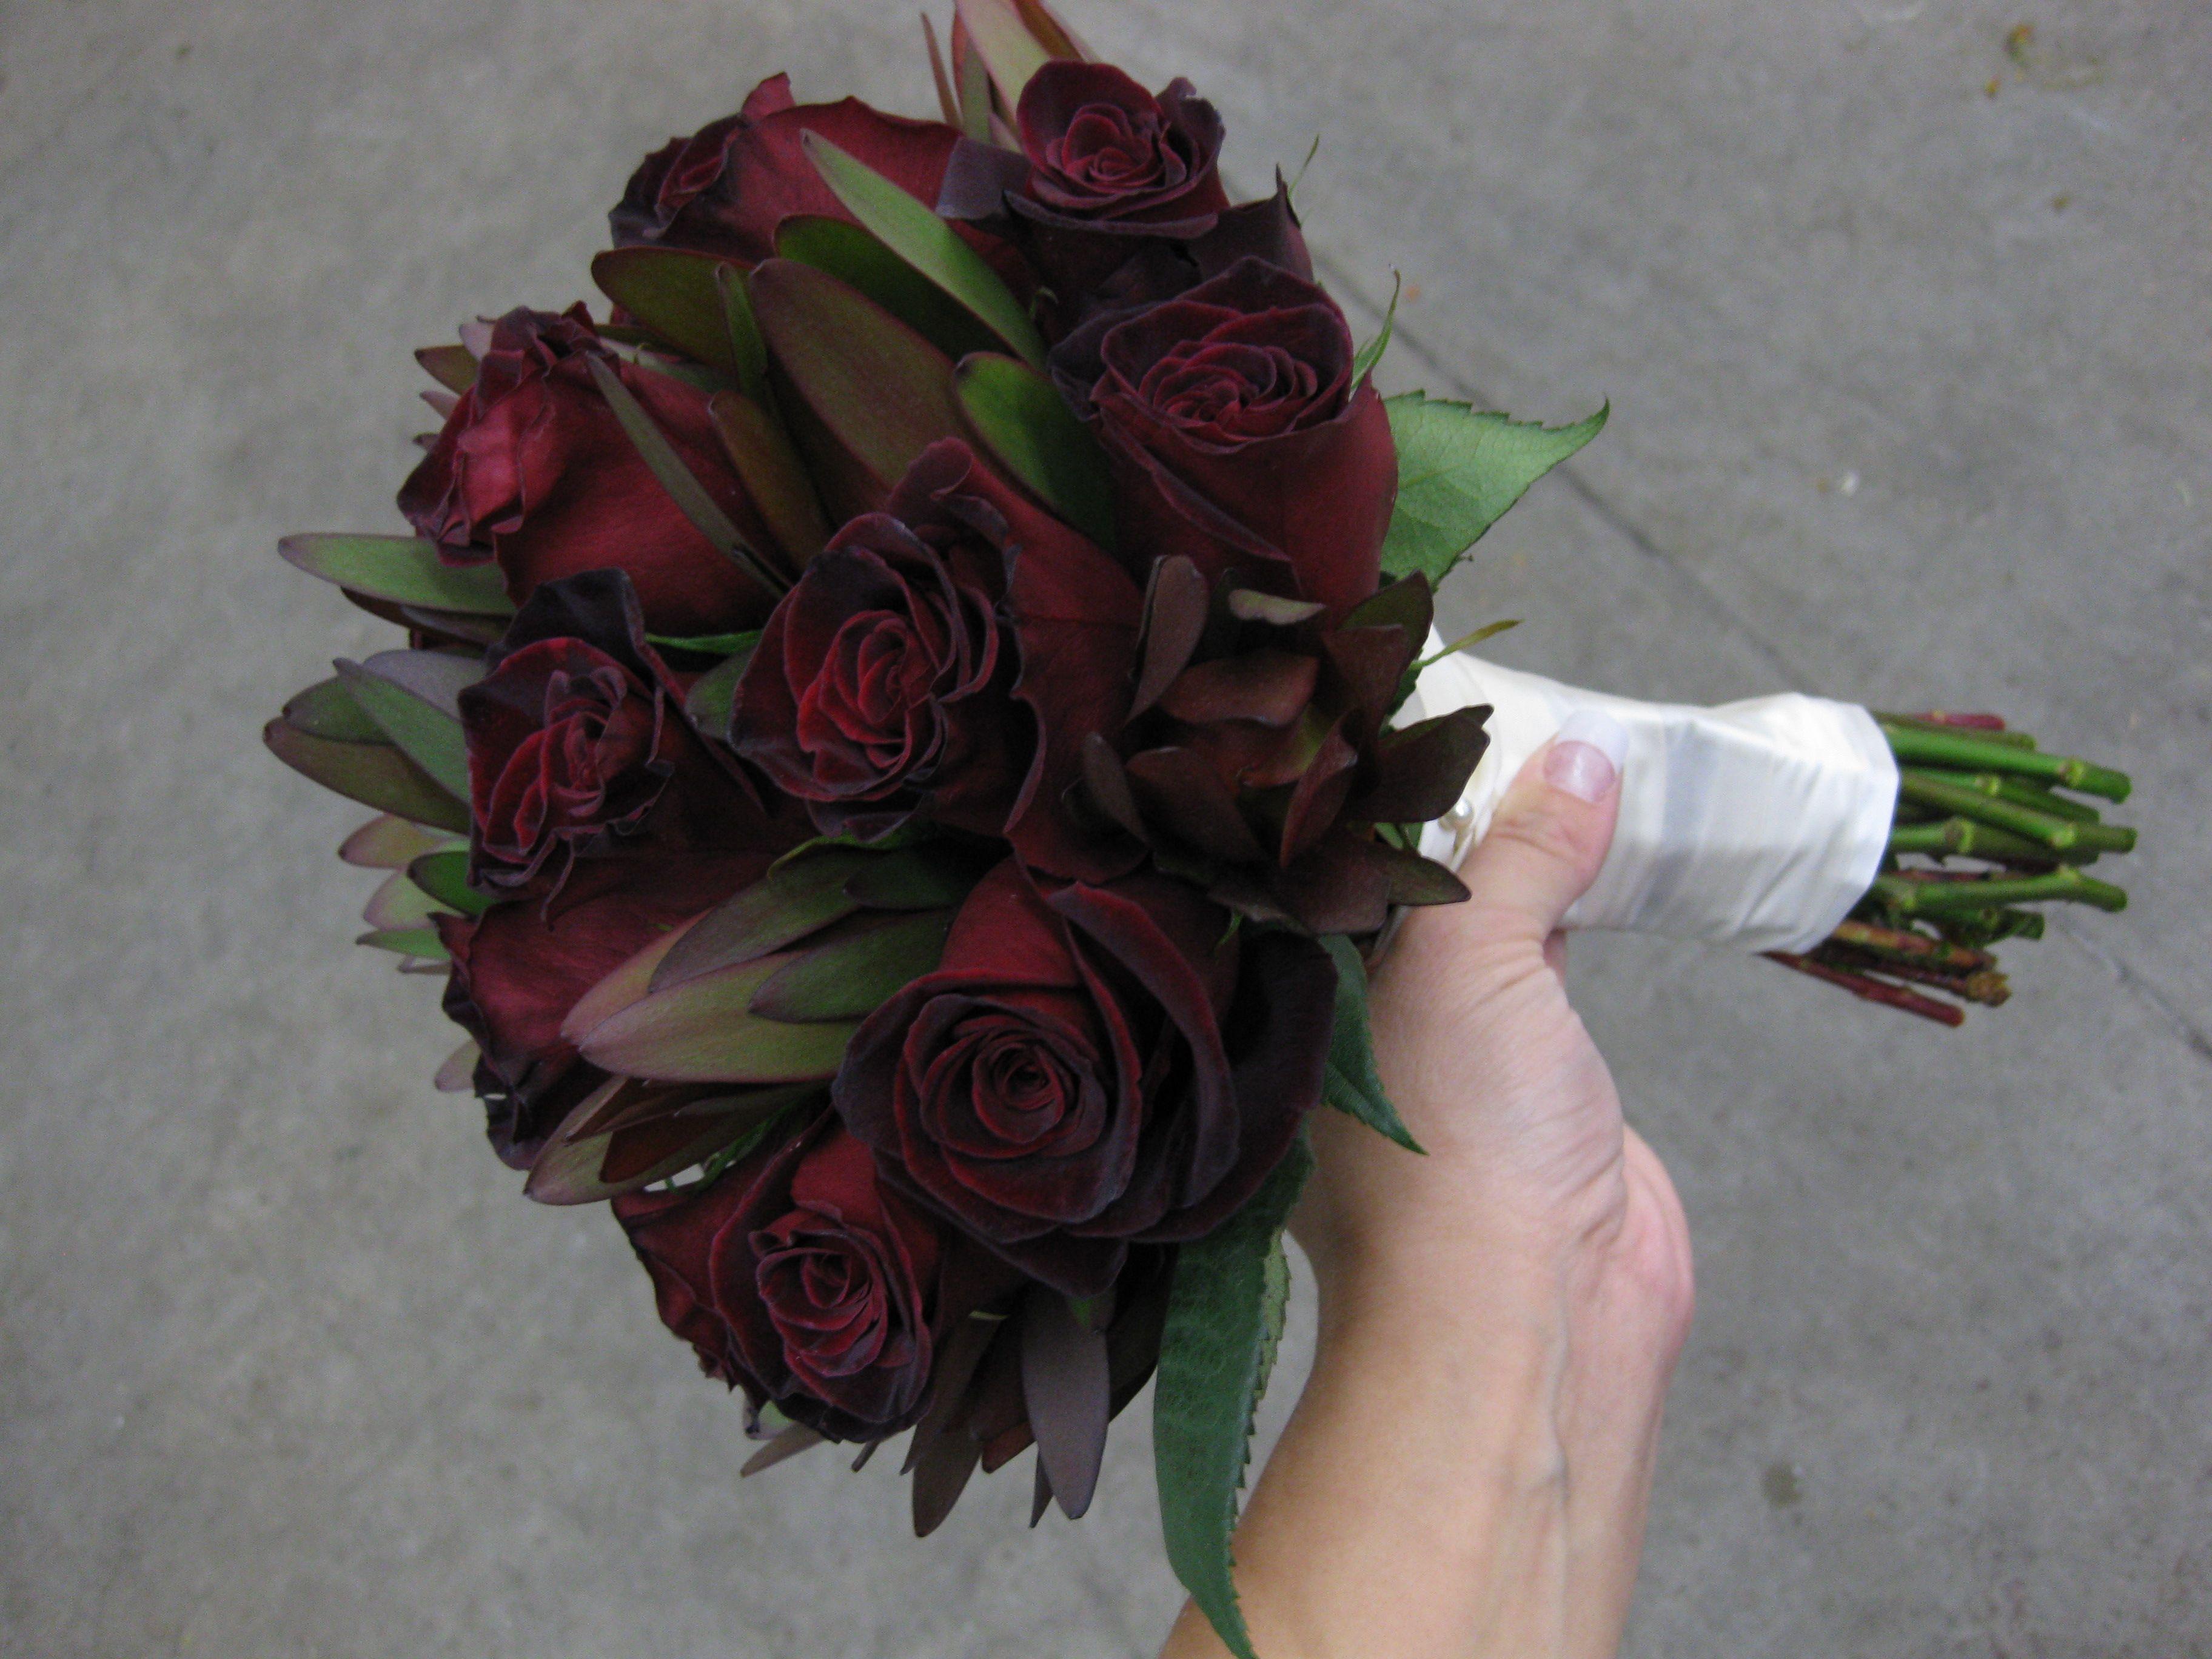 Google Image Result For Http Stadiumflowers Files WordPress 2010 10 Black Baccara Rose Side View Jpg Wedding Ideas Pinterest Bride Bouquets